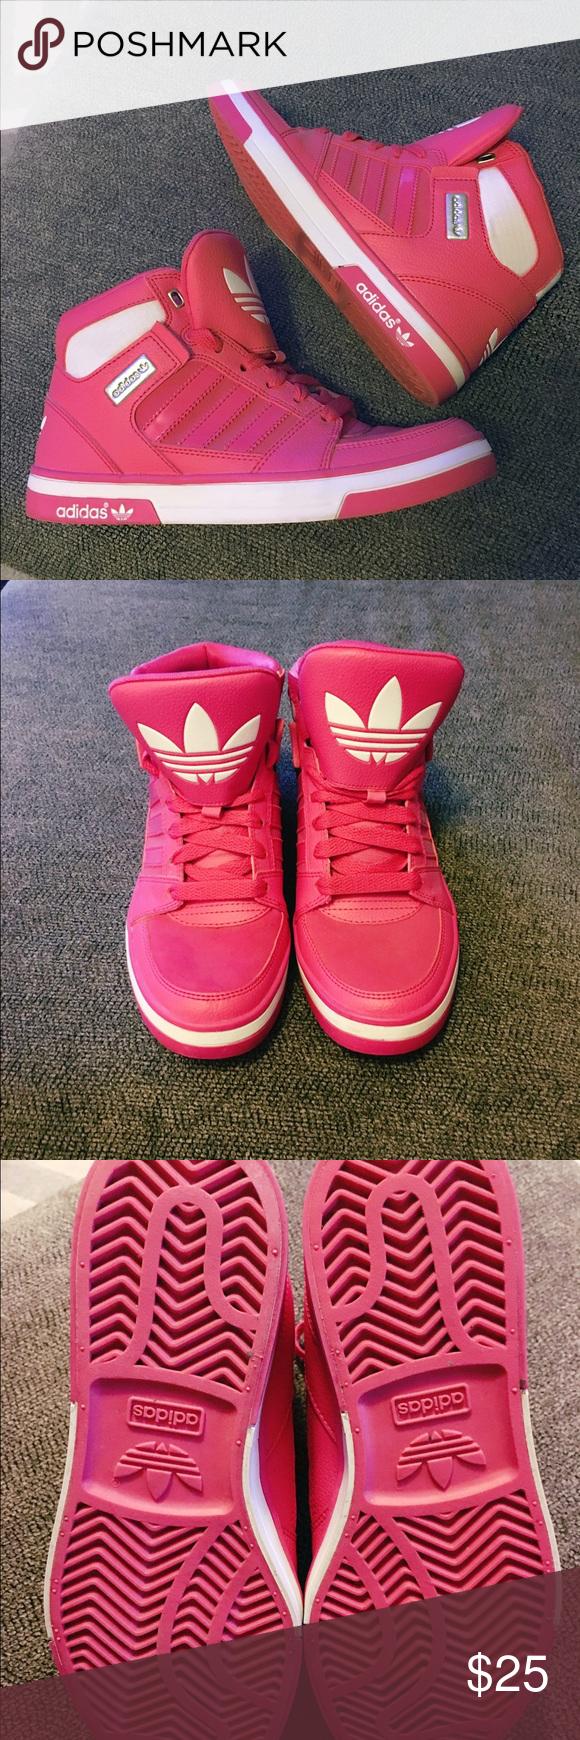 Adidas Ortholite High Tops como nueva 5y = 7 mujeres mi Posh Picks